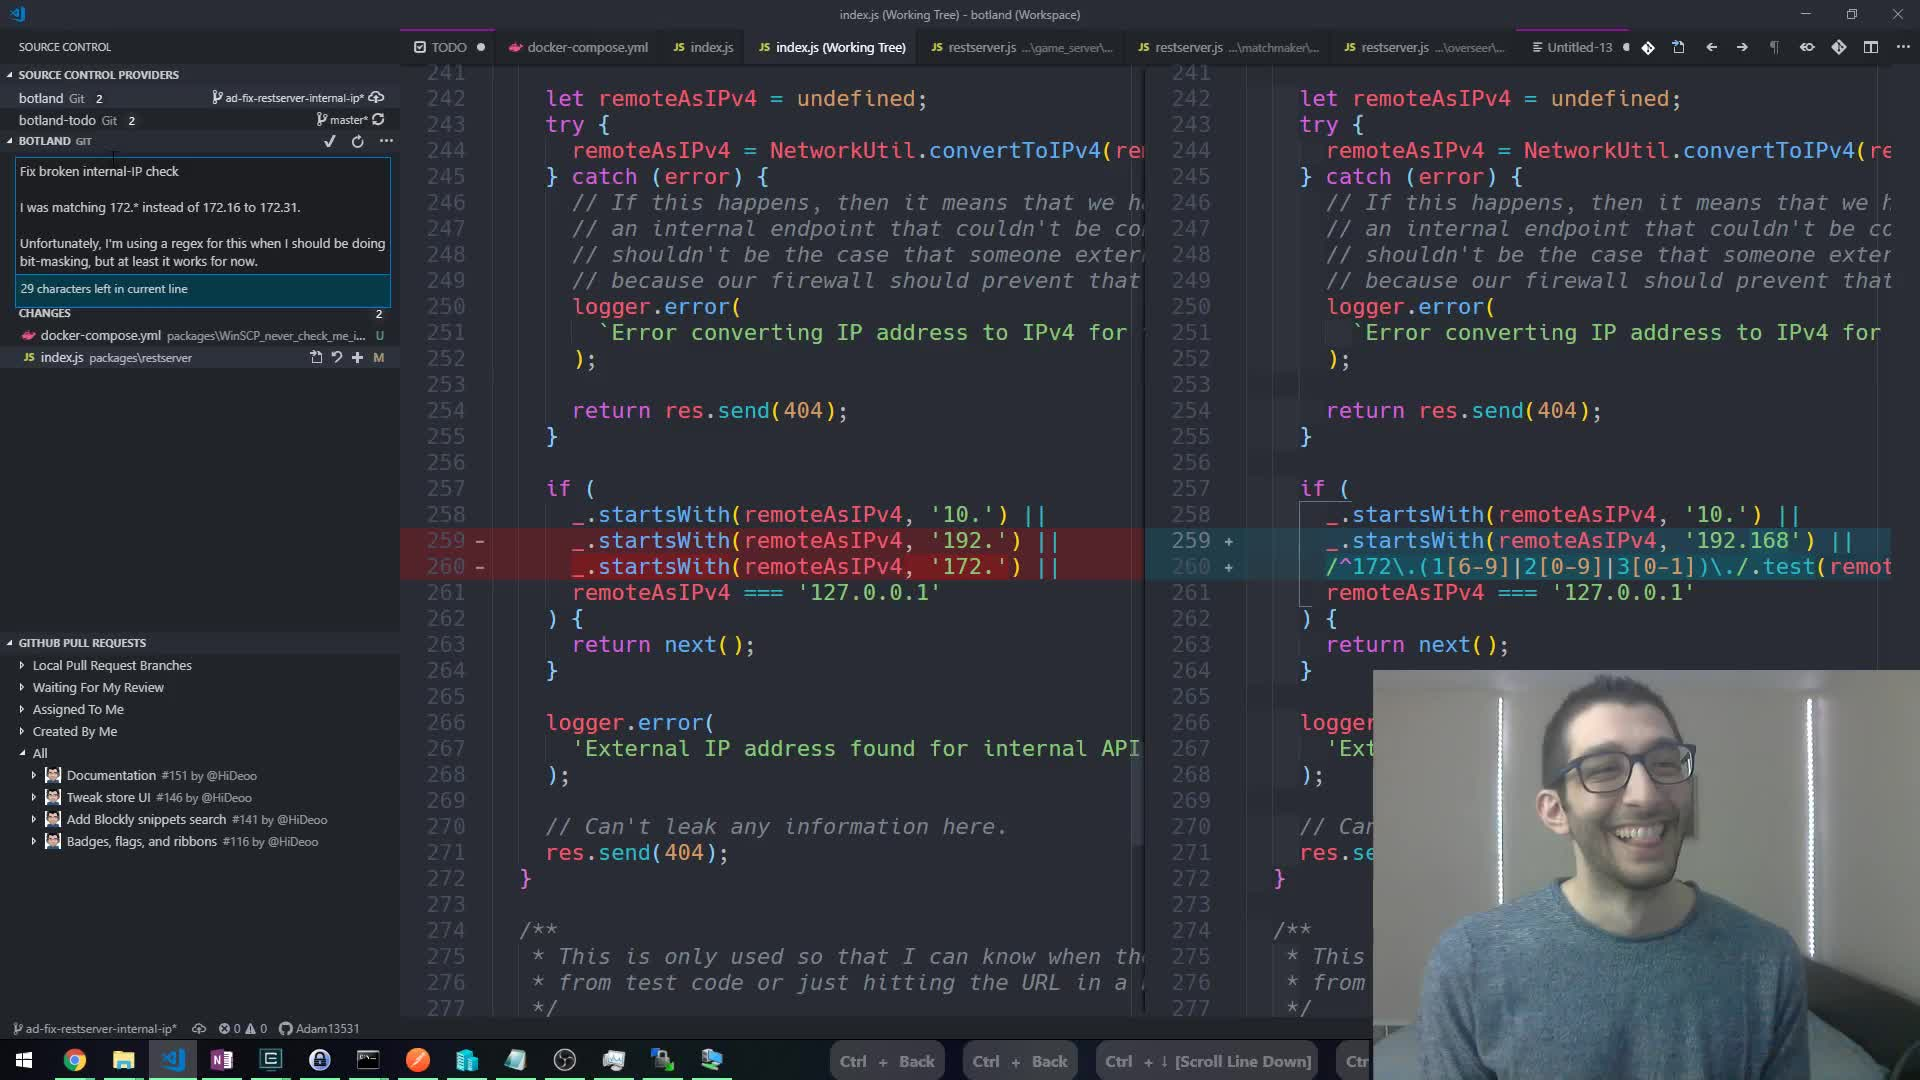 Adam13531 - Sick code, bro (day 608) - Twitch